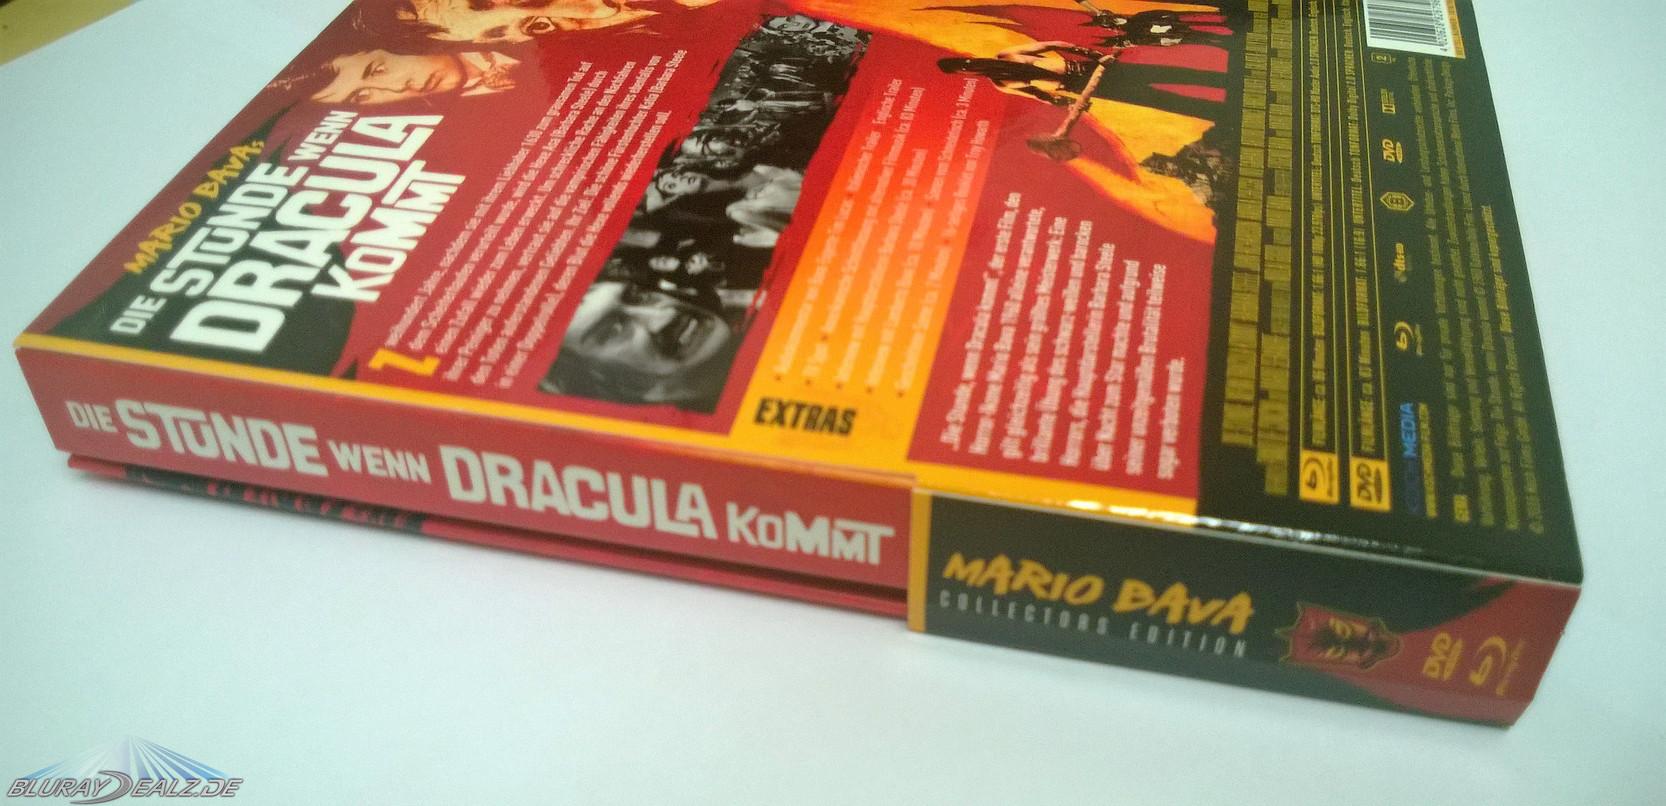 Fotos] Die Stunde, wenn Dracula kommt – Mario Bava-Collection #1 ...